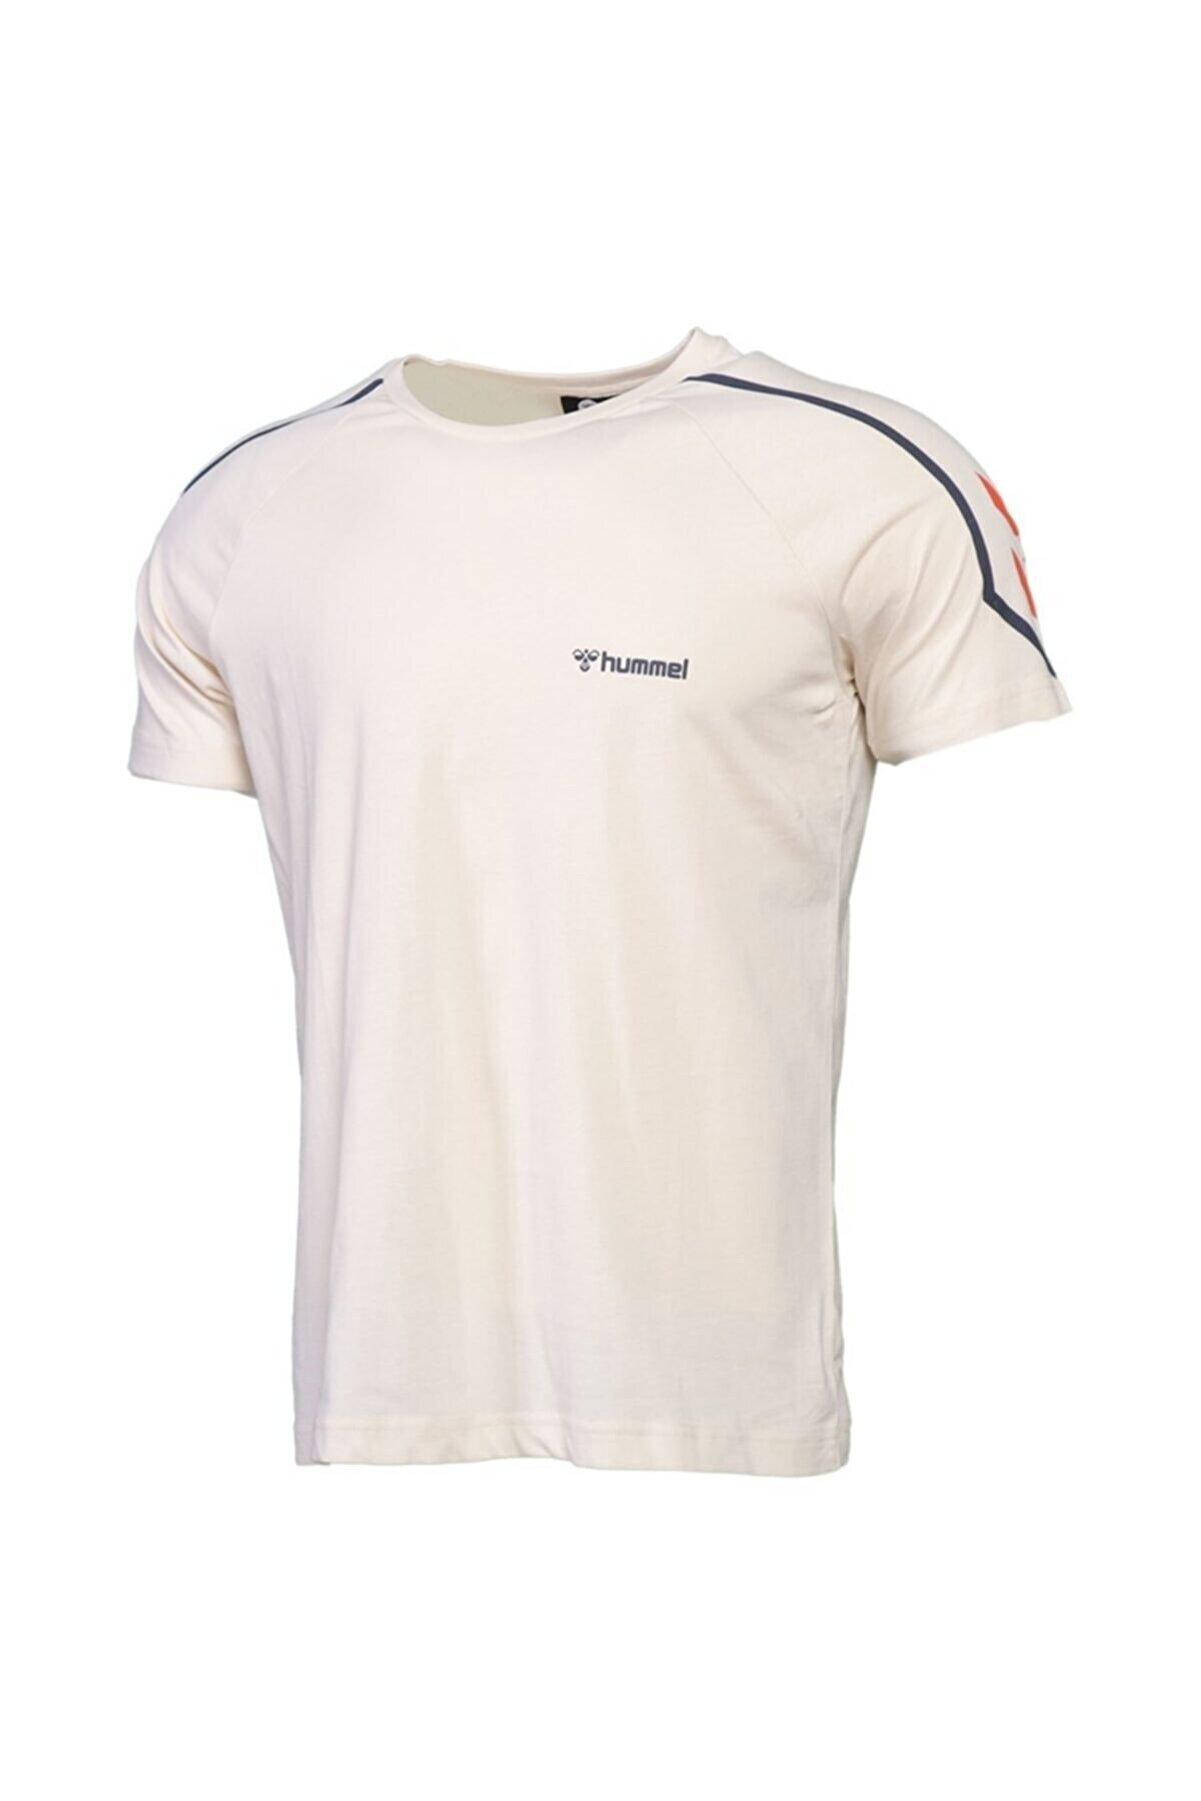 HUMMEL HMLADMON T-SHIRT S/S TEE Ekru Erkek T-Shirt 101086470